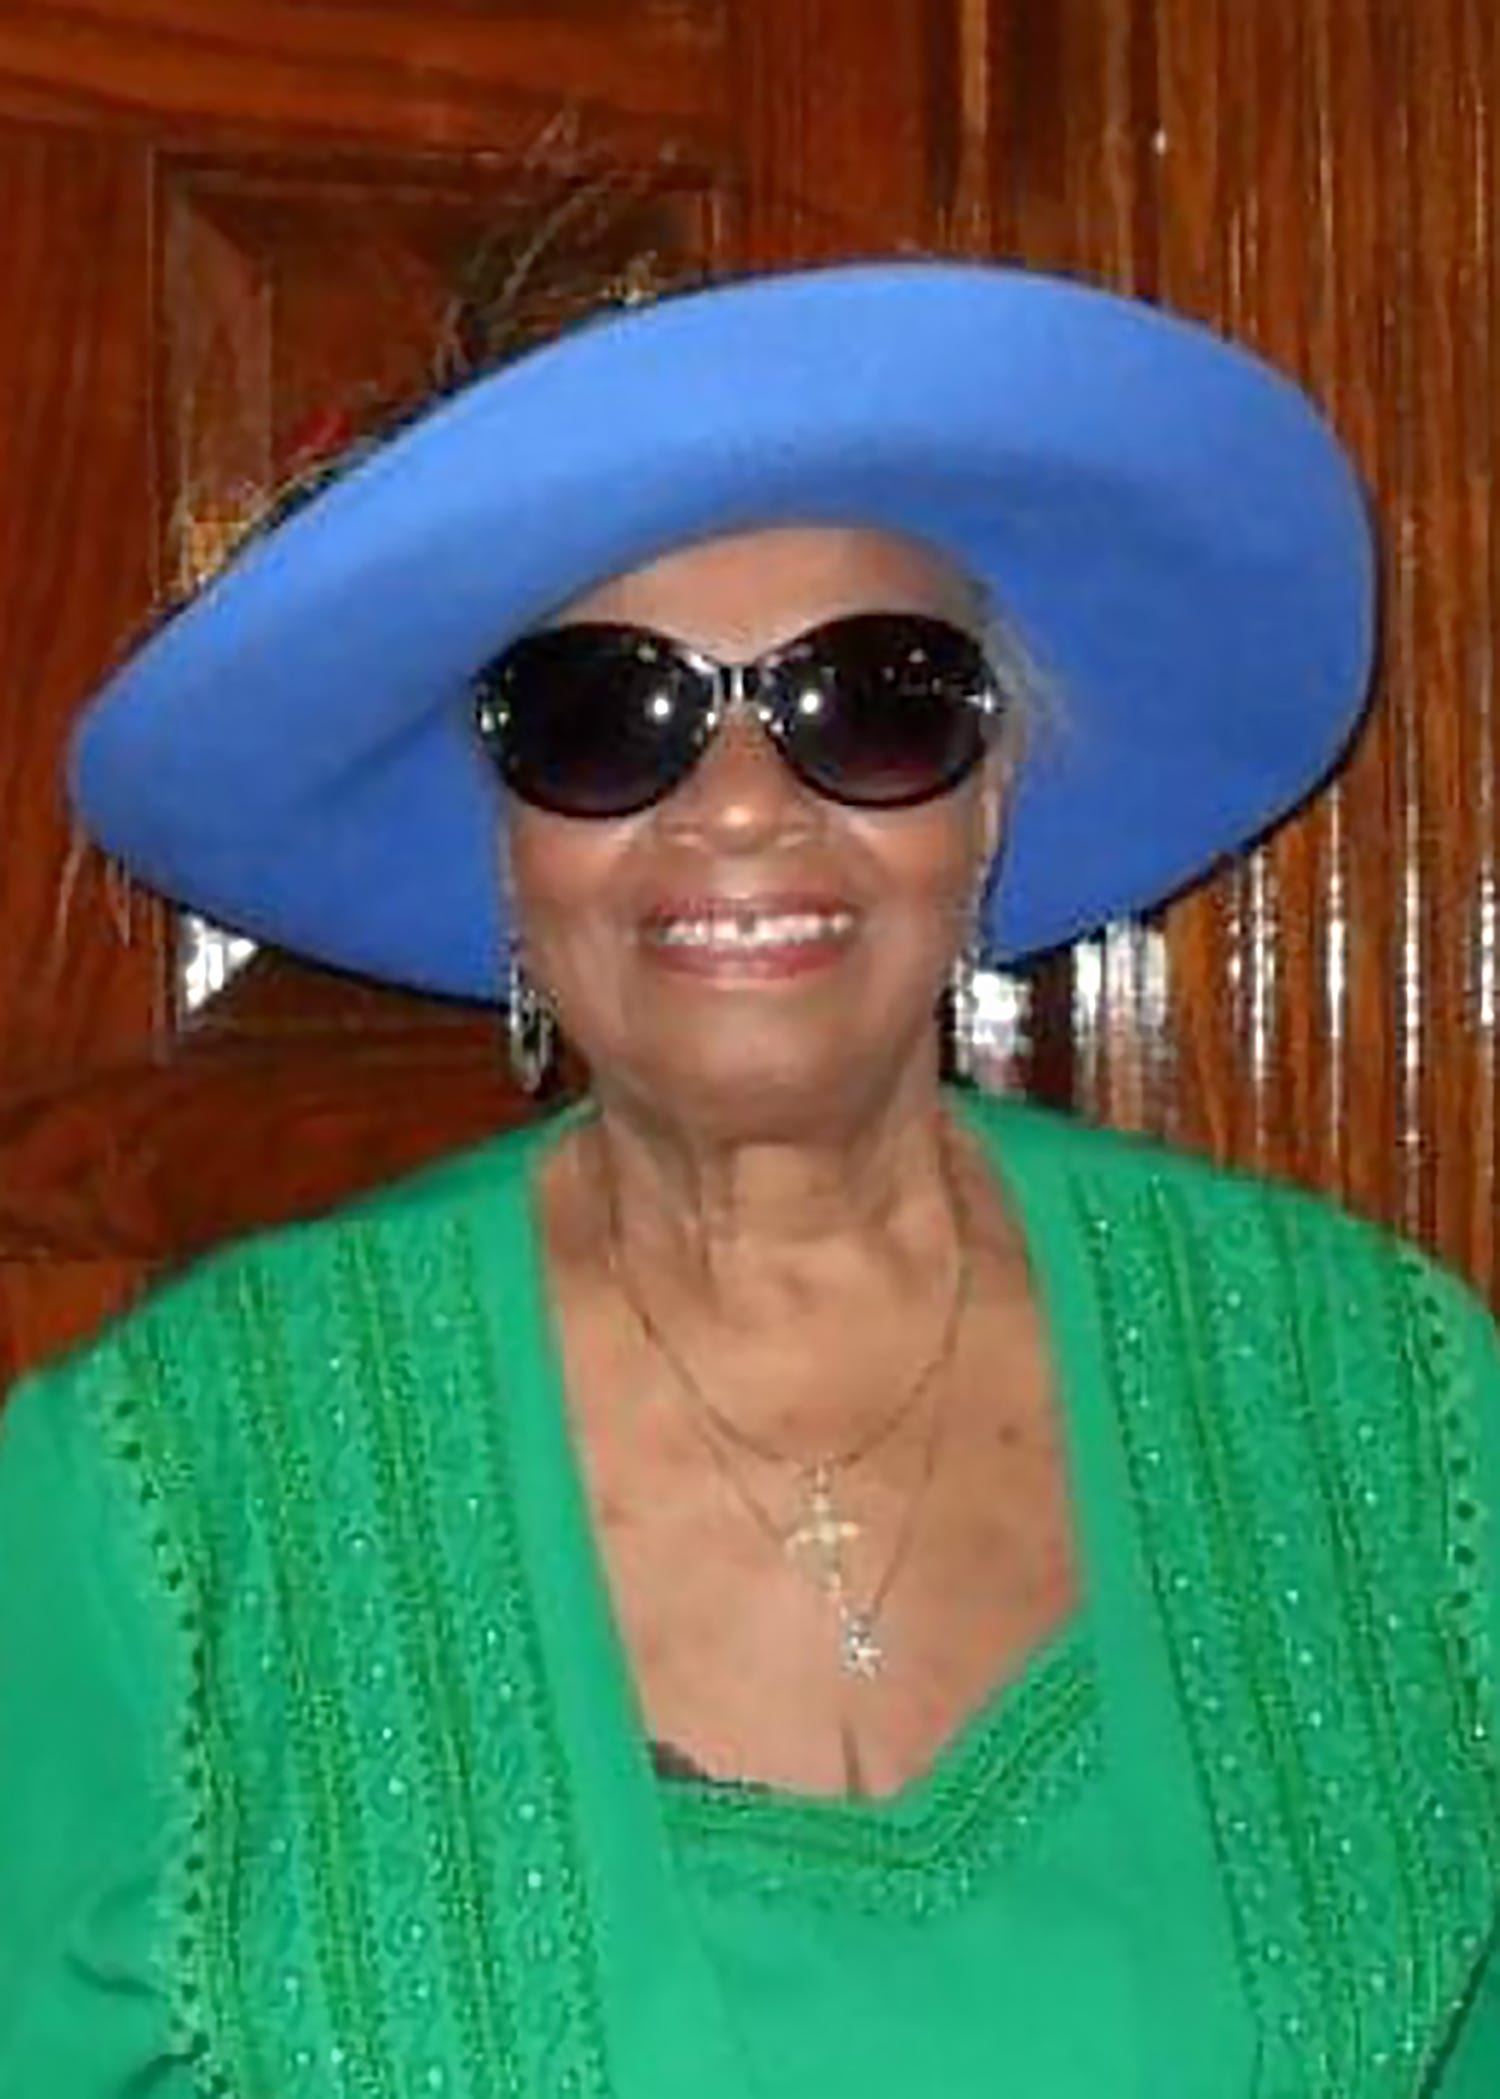 Narvellee Cavitt, 87, of Detroit, died April 3.